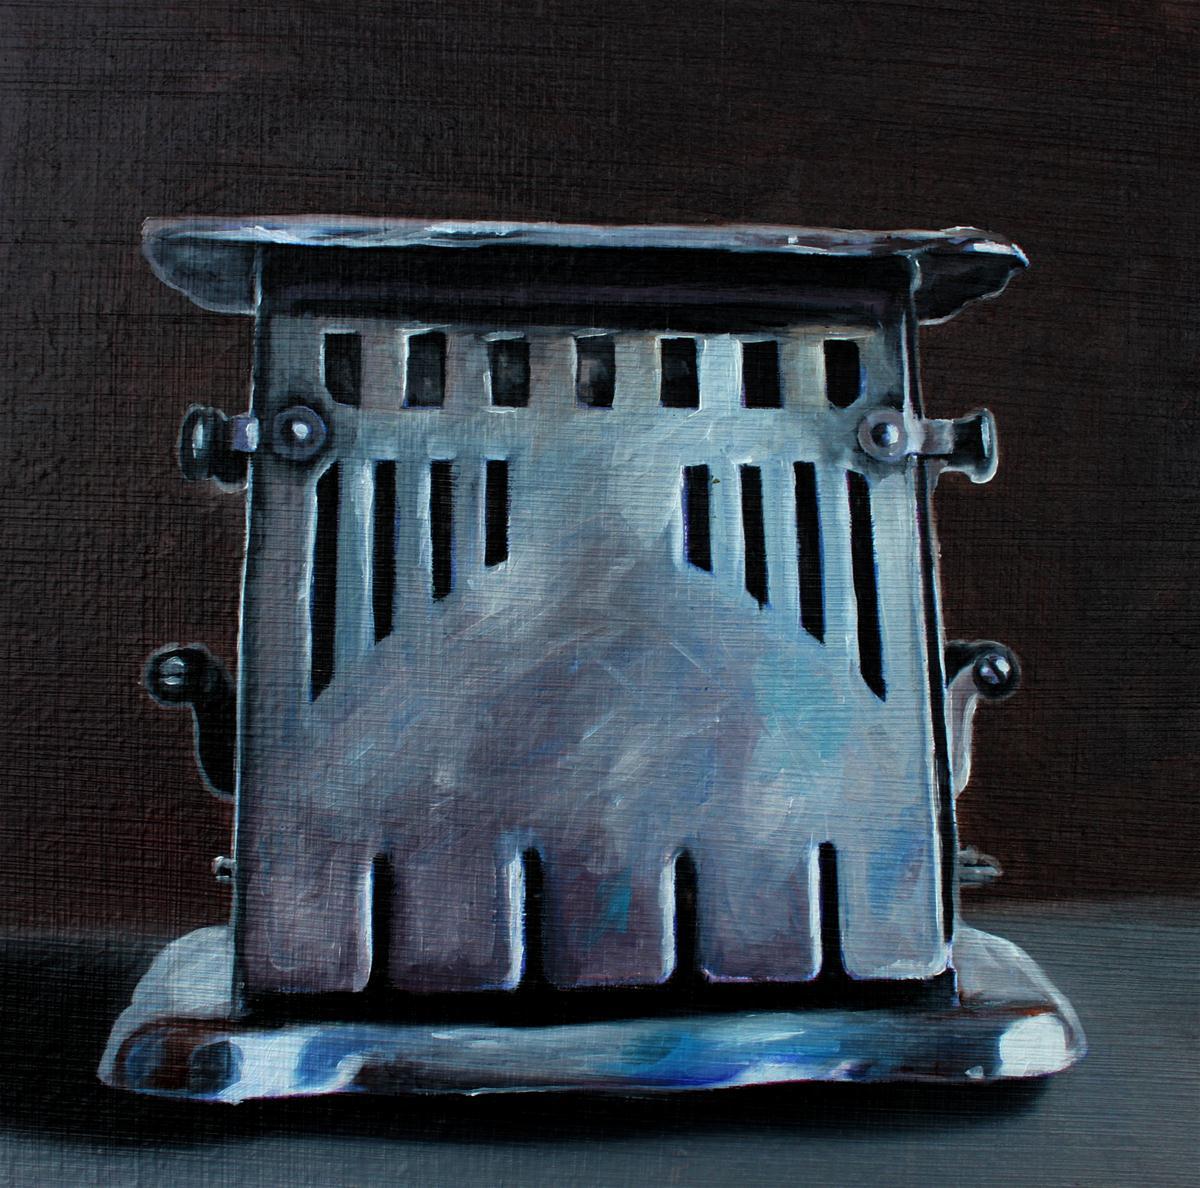 """Vintage Toaster"" original fine art by Lauren Pretorius"